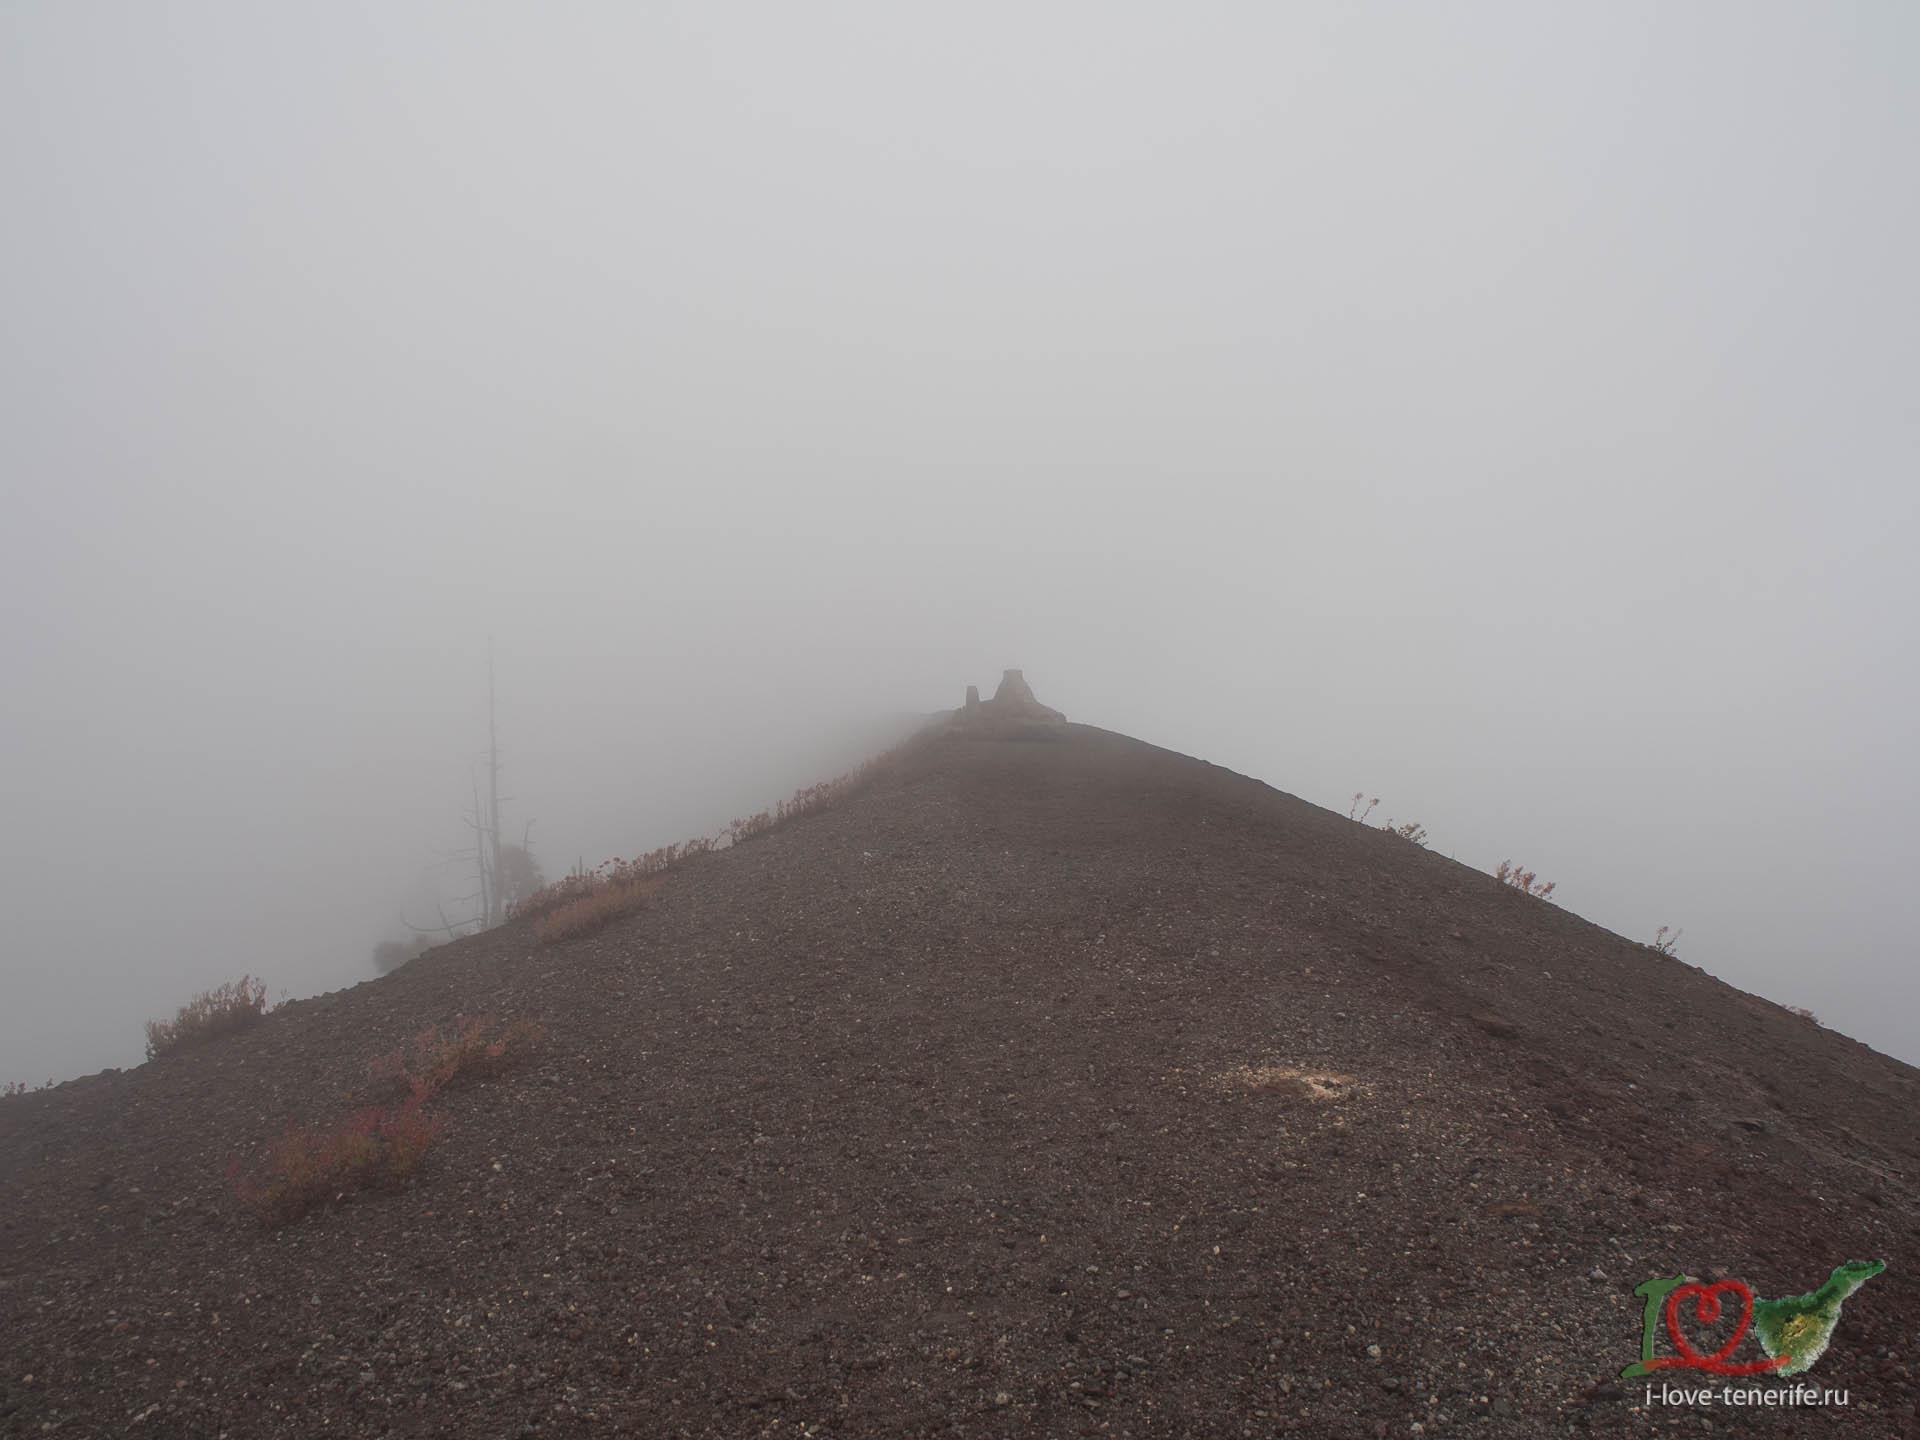 Пеший маршрут по Тенерифе вокруг в